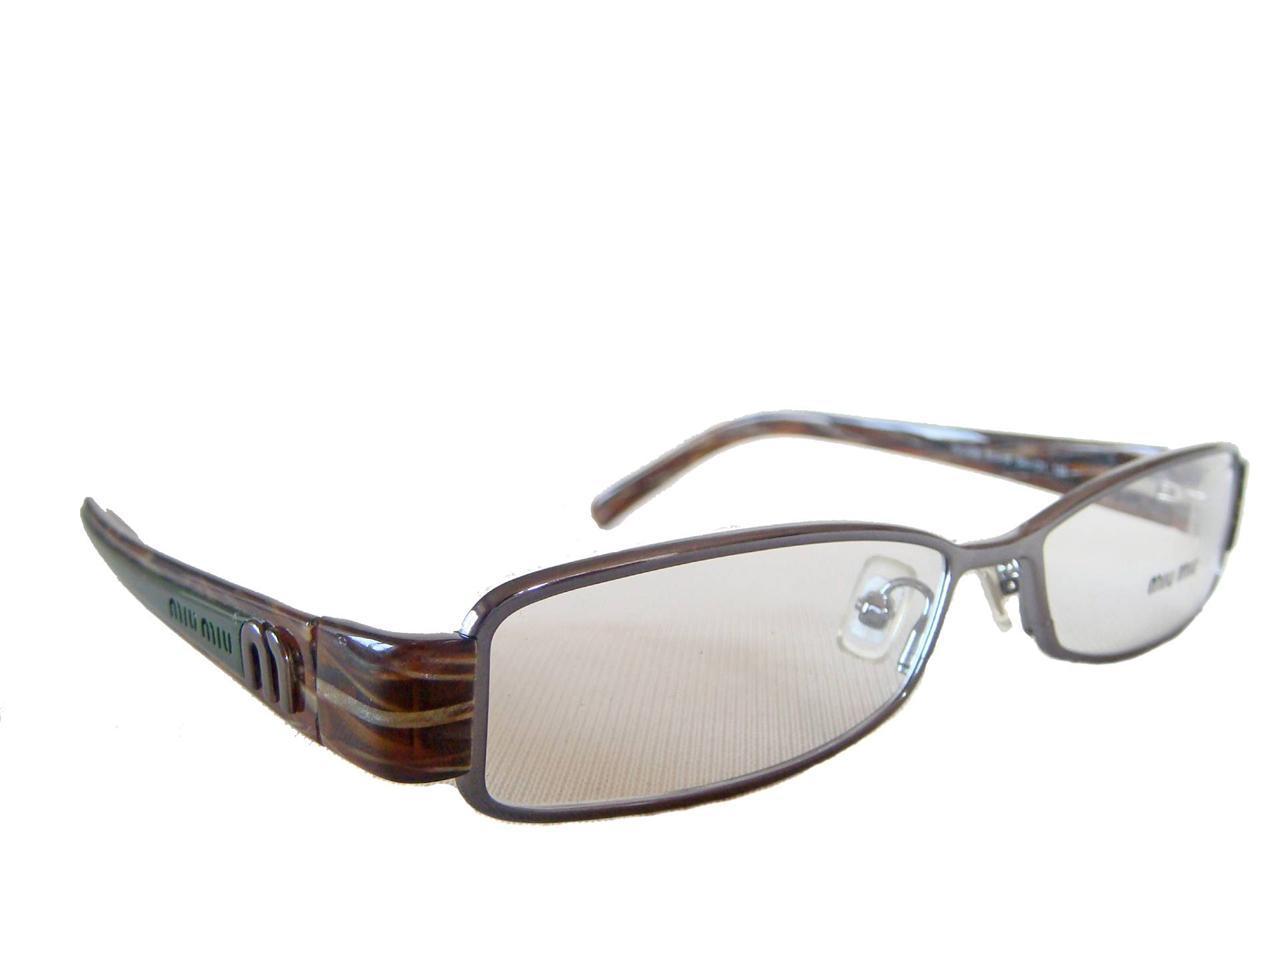 miu miu by prada vmu 60e 5av 1o1 glasses spectacles